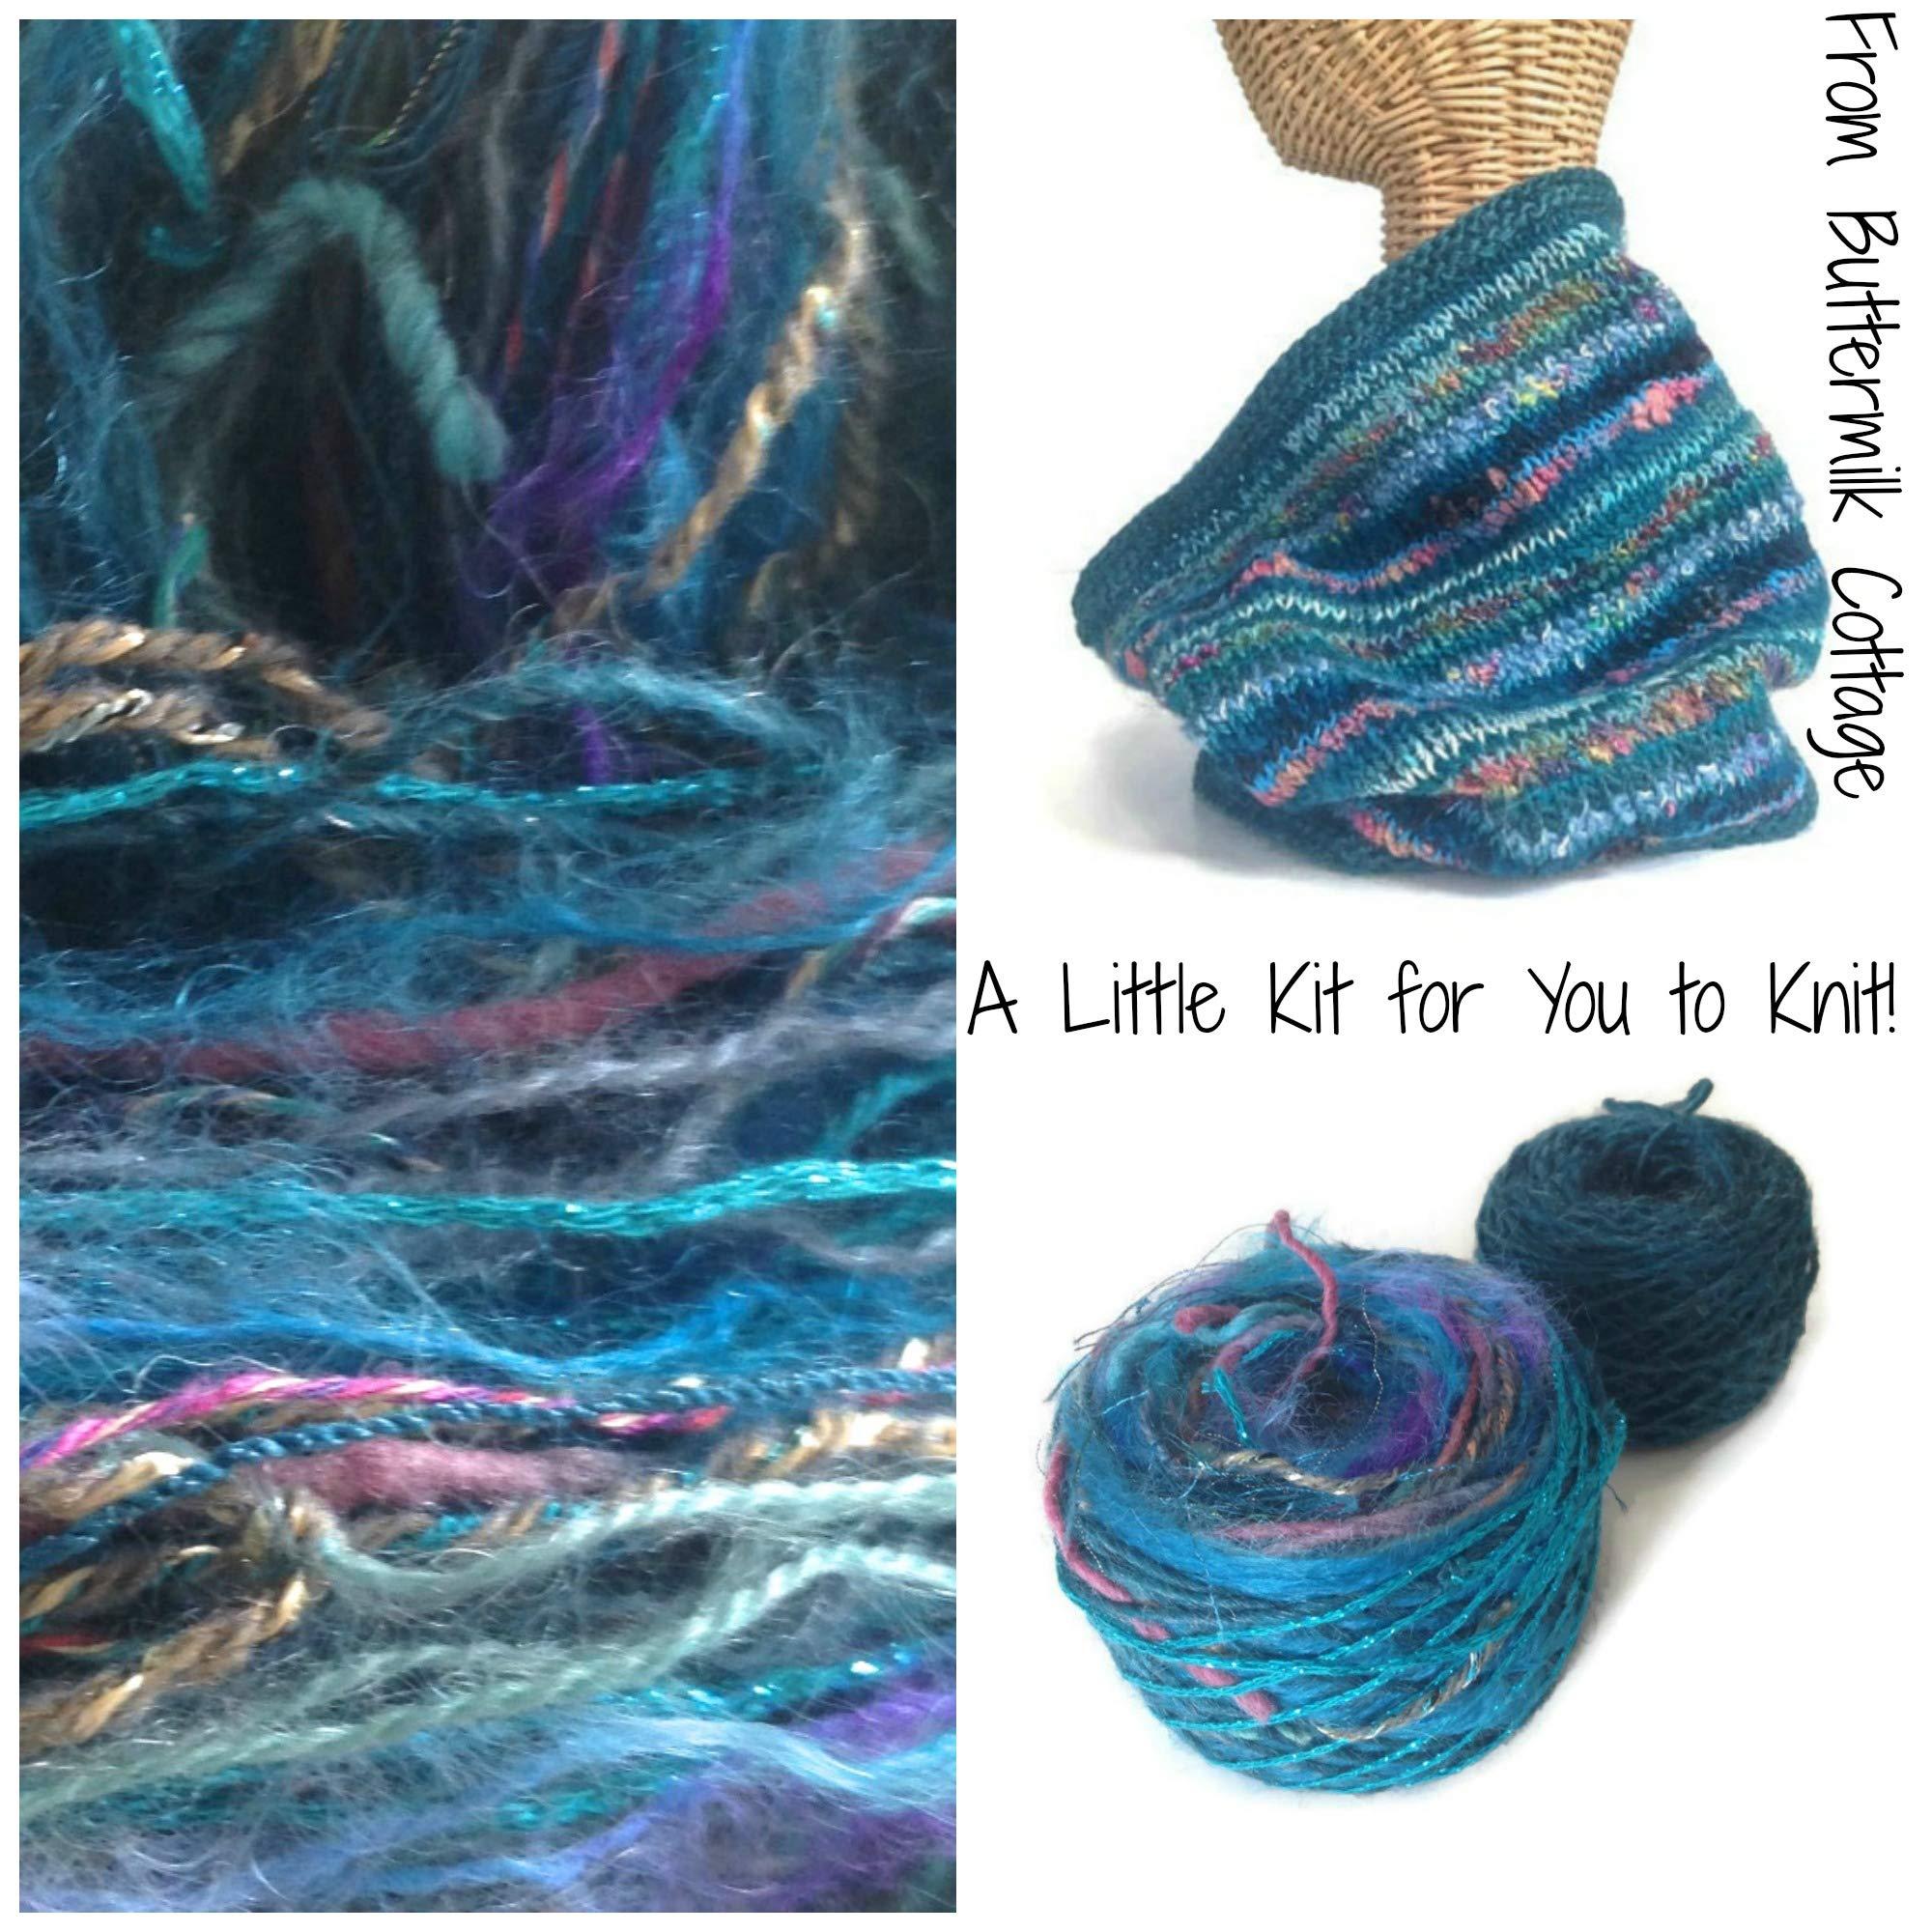 Boutique Yarn Cowl Knitting Kit Teal